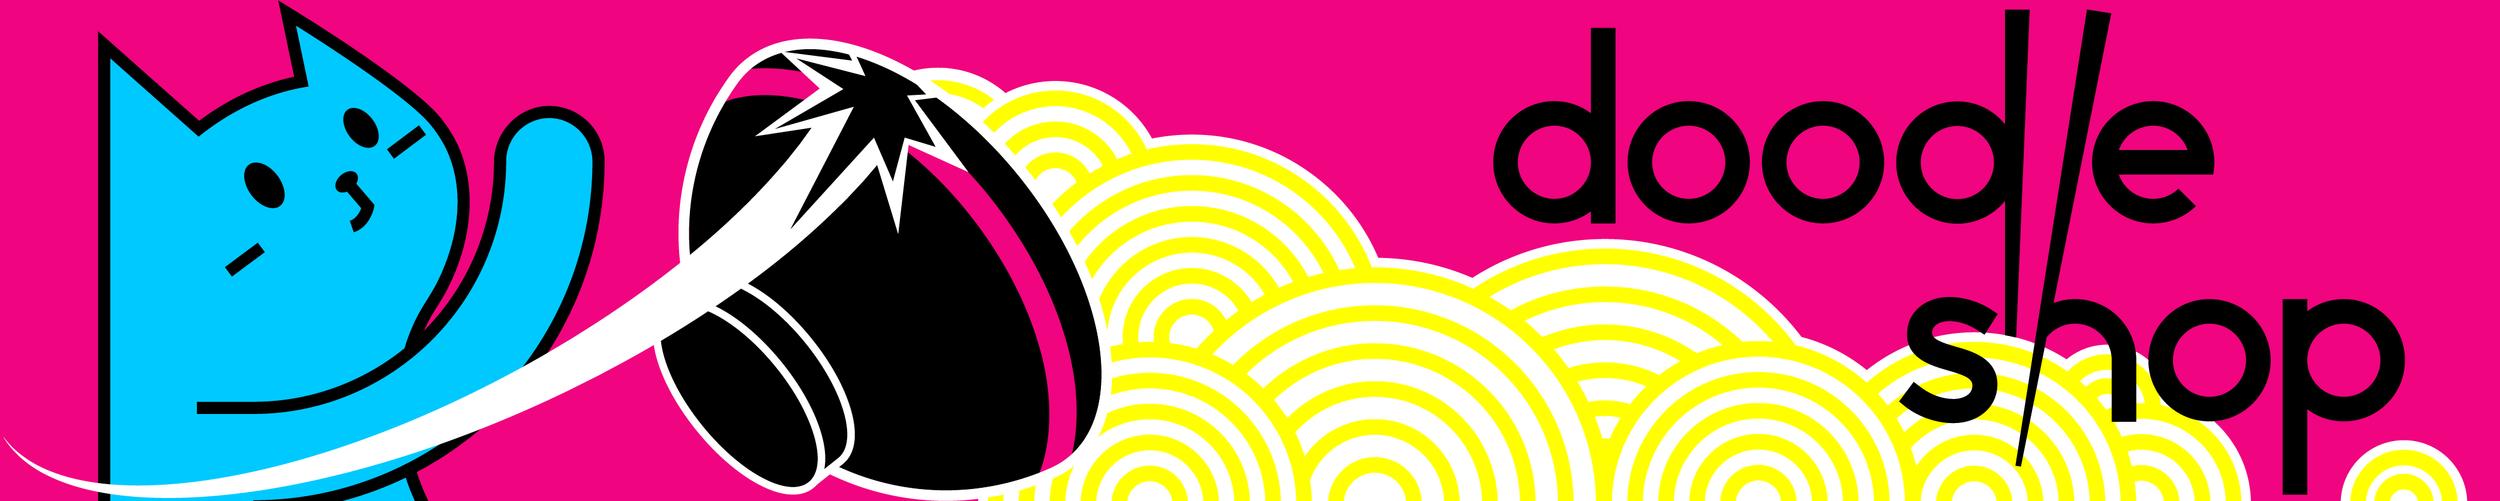 doodleshop-06-03.png